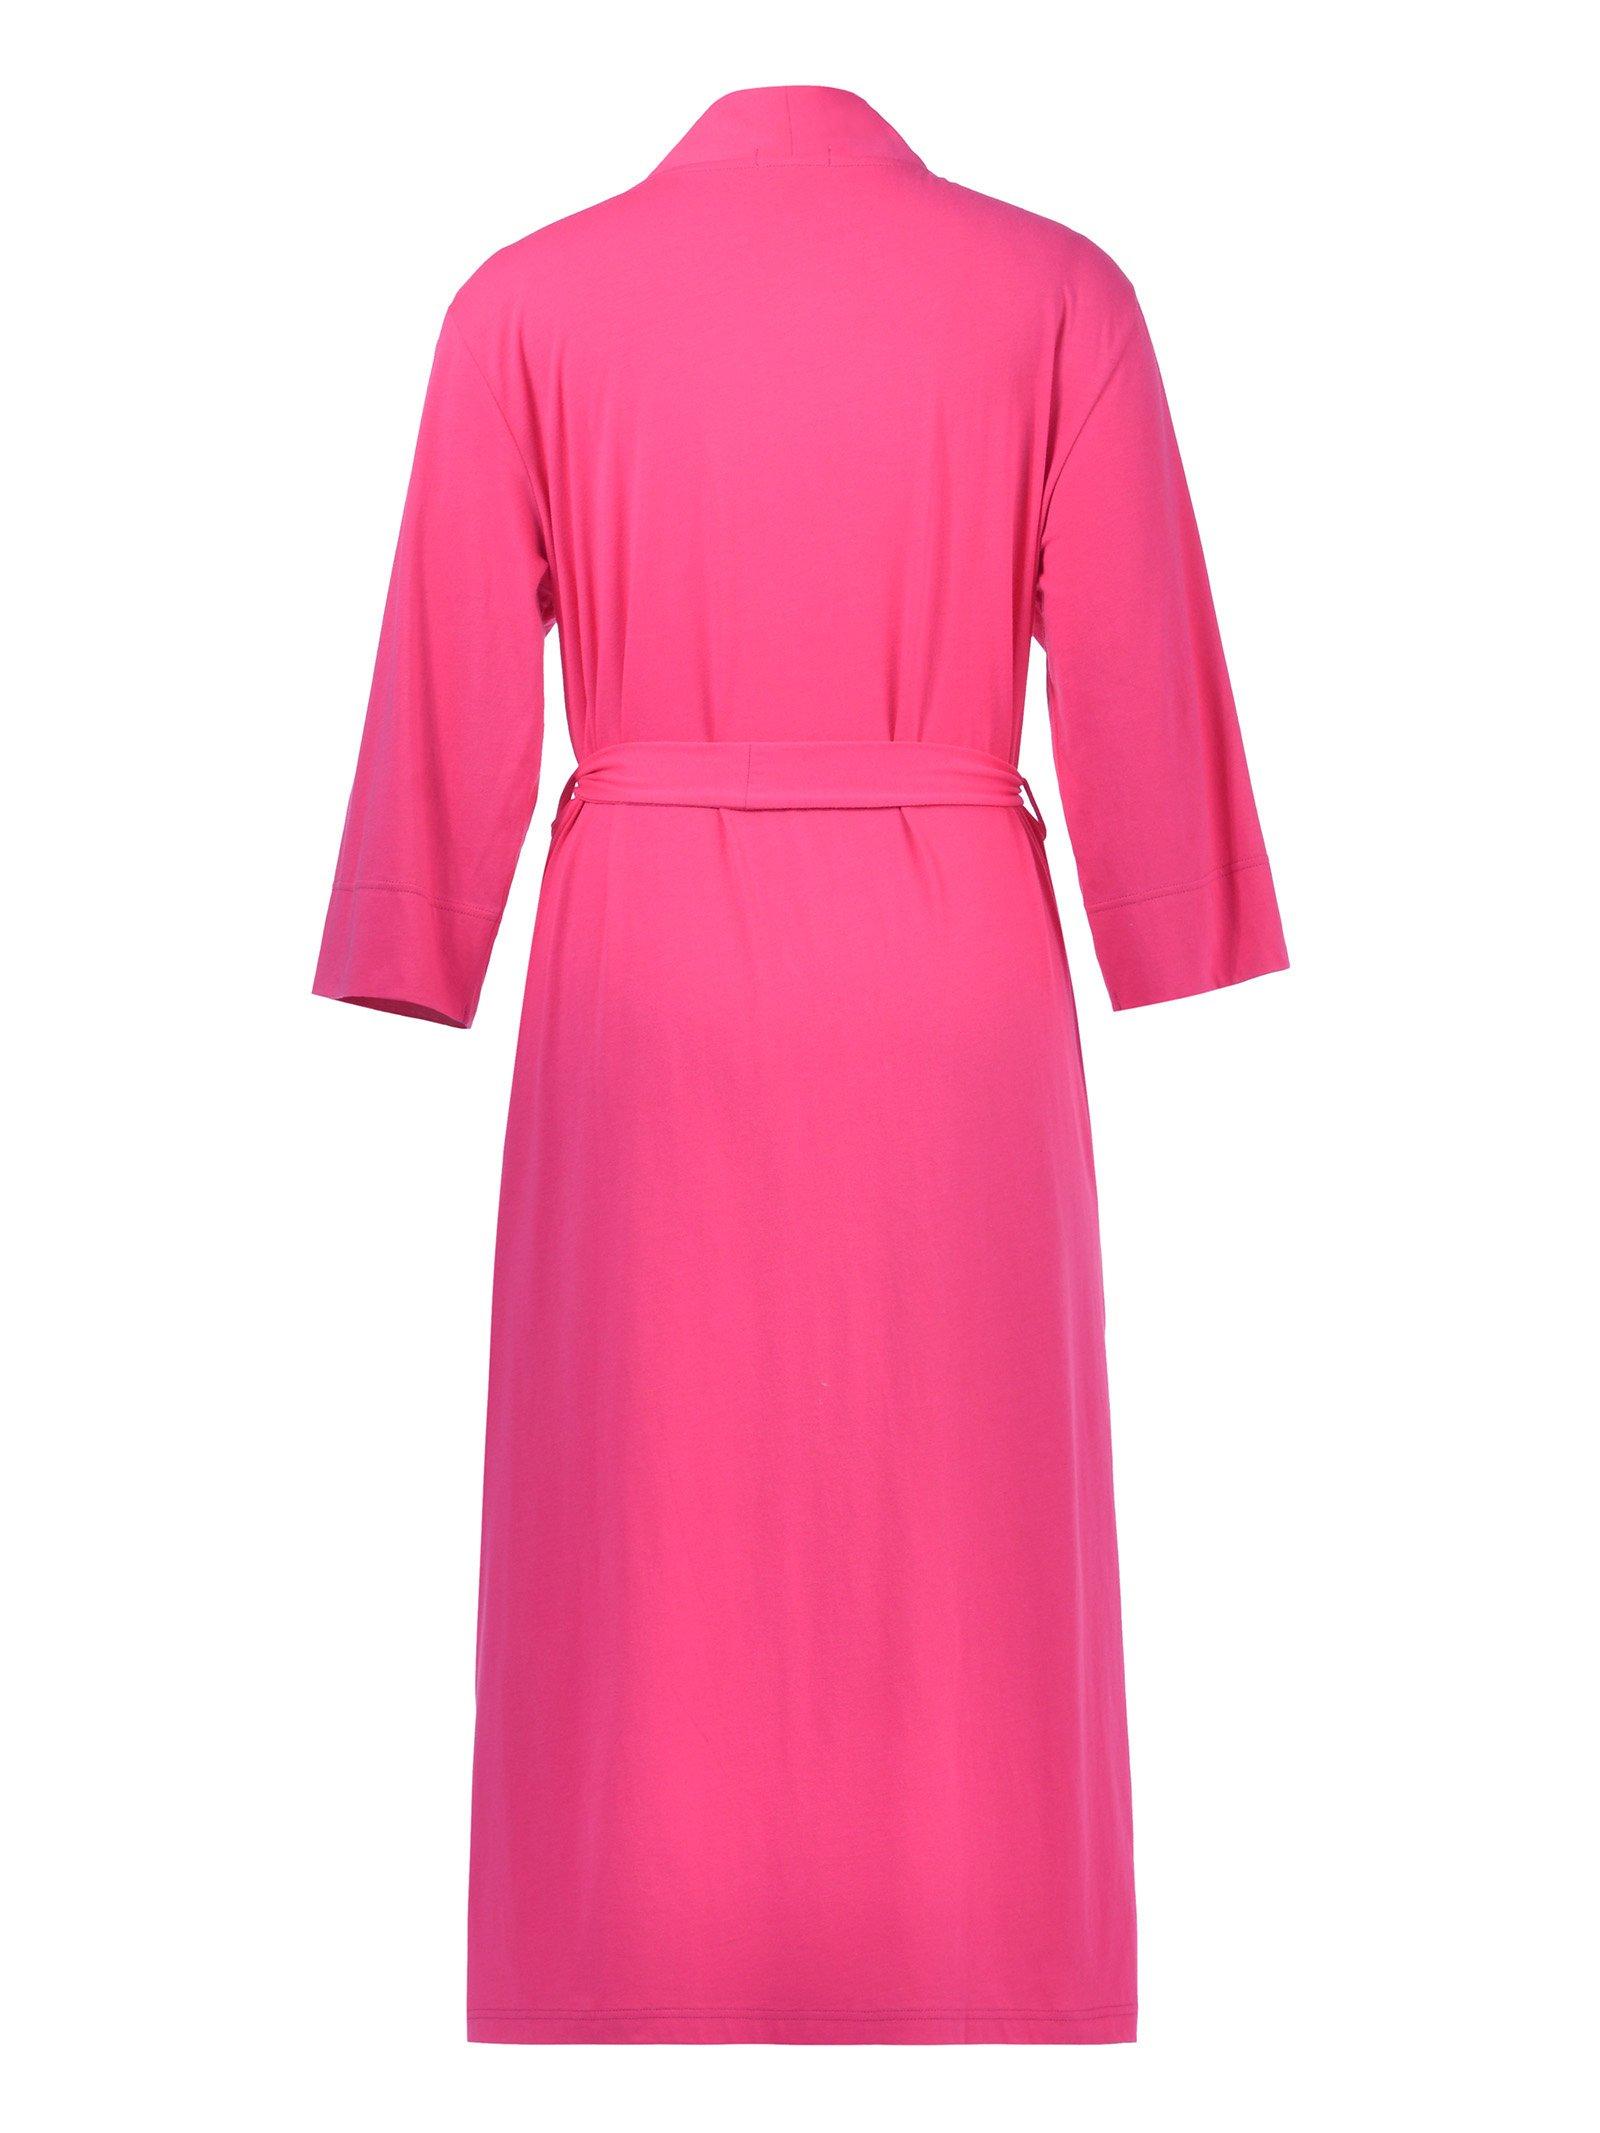 SIORO Womens Cotton Nightgown Sleeveless Sleep Shirts Long Soft Pajamas  Wear Around Nightshirt bc5570d53